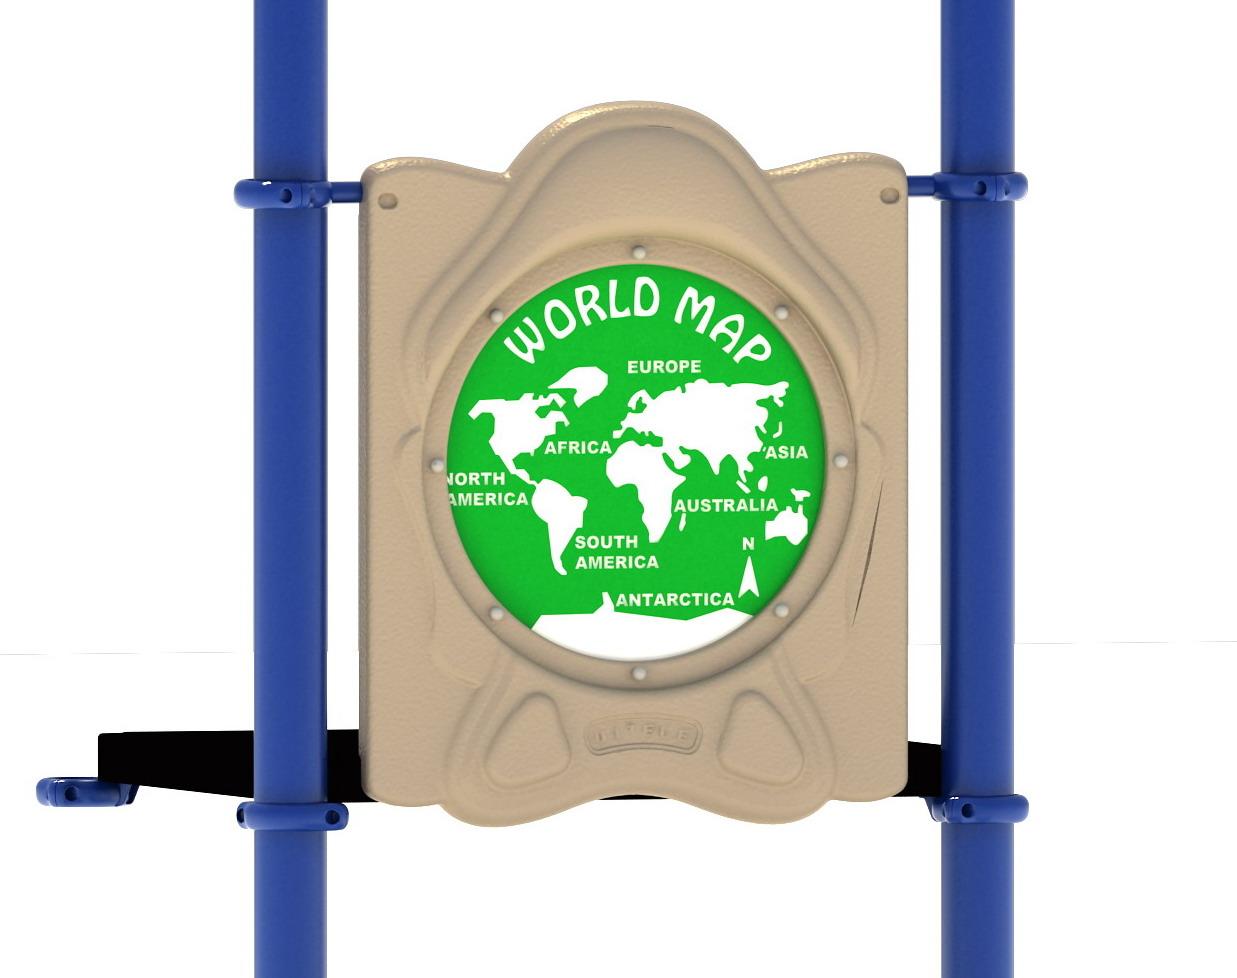 mx-world-map-panel